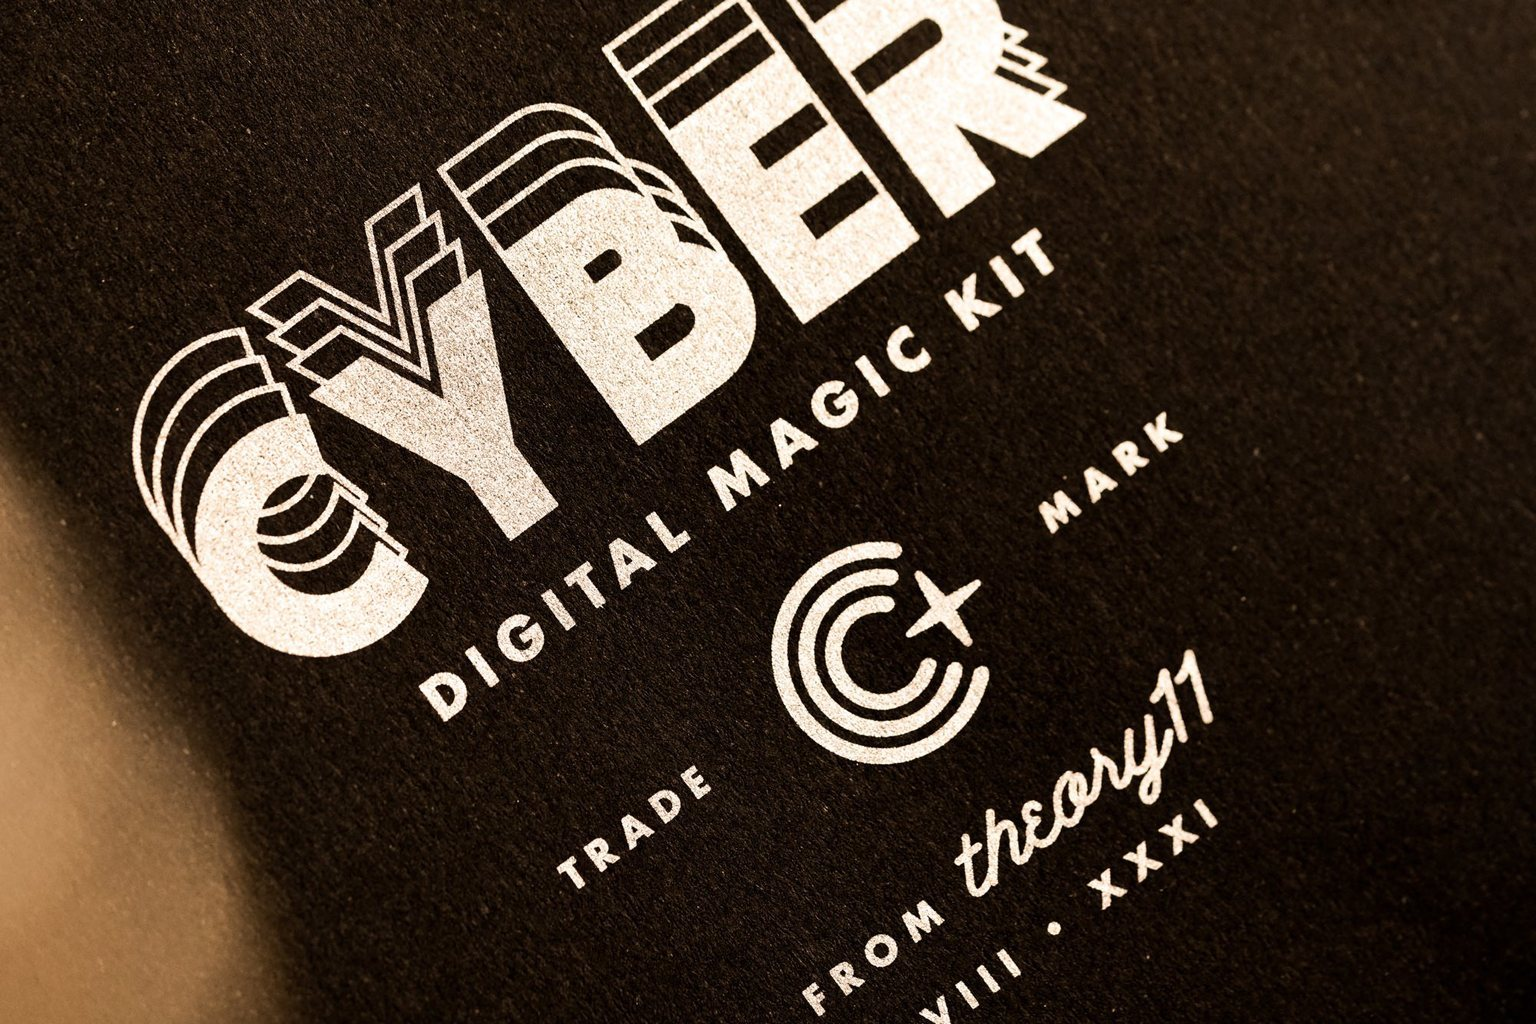 Cyber-Magic-Packaging-03135_2000x1024.jpg